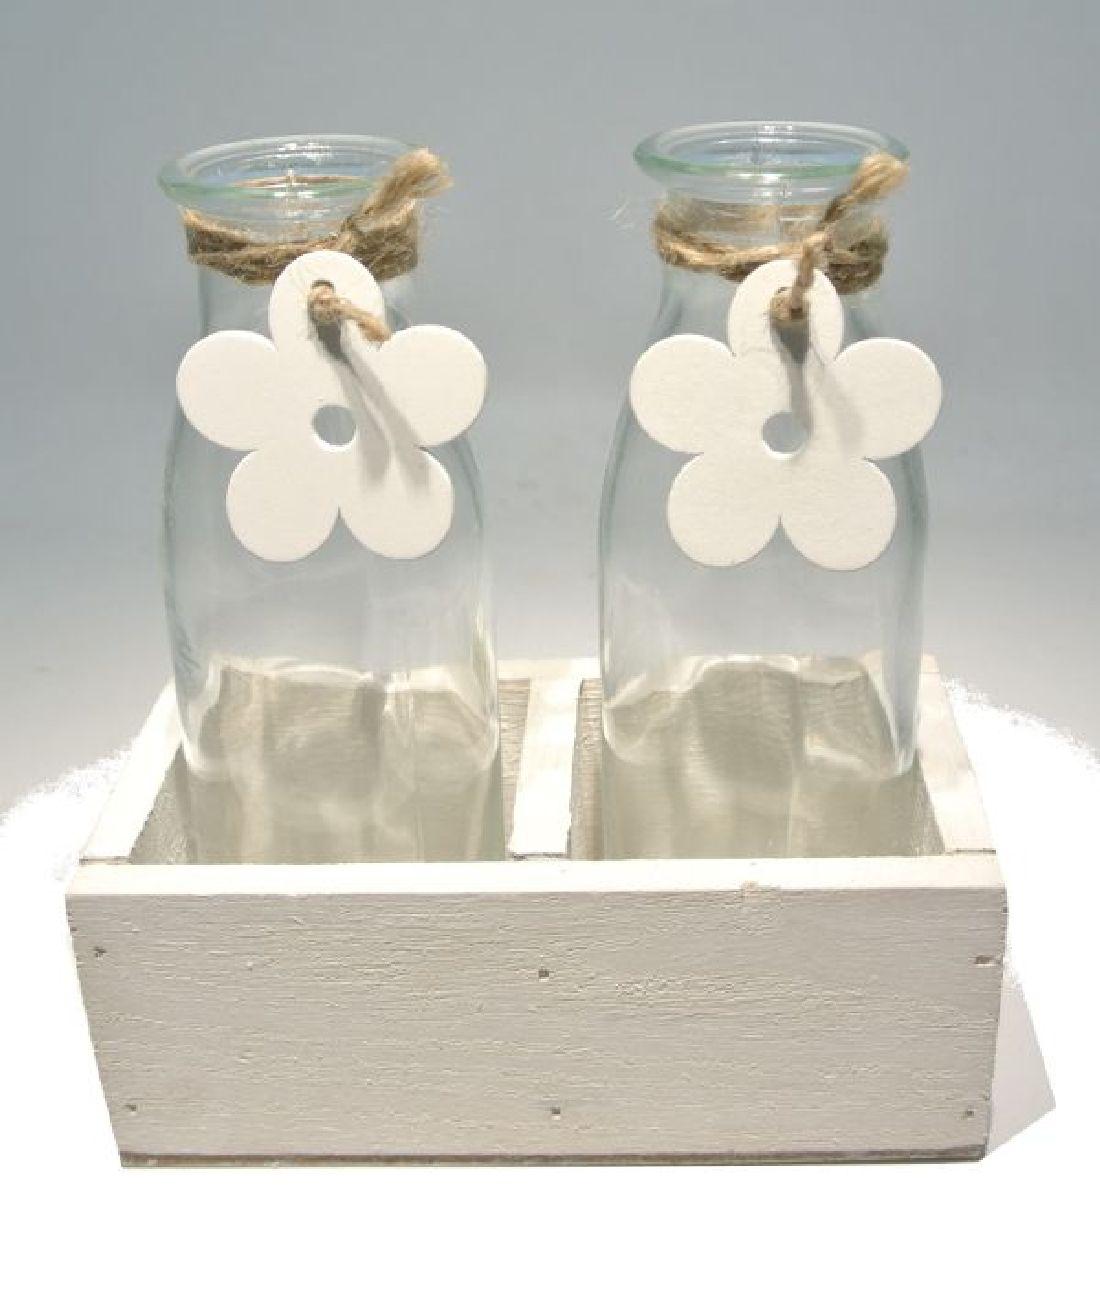 Glasflasche Flower in Holzbox WEISS 17804 2er 13x7xH14,5cm